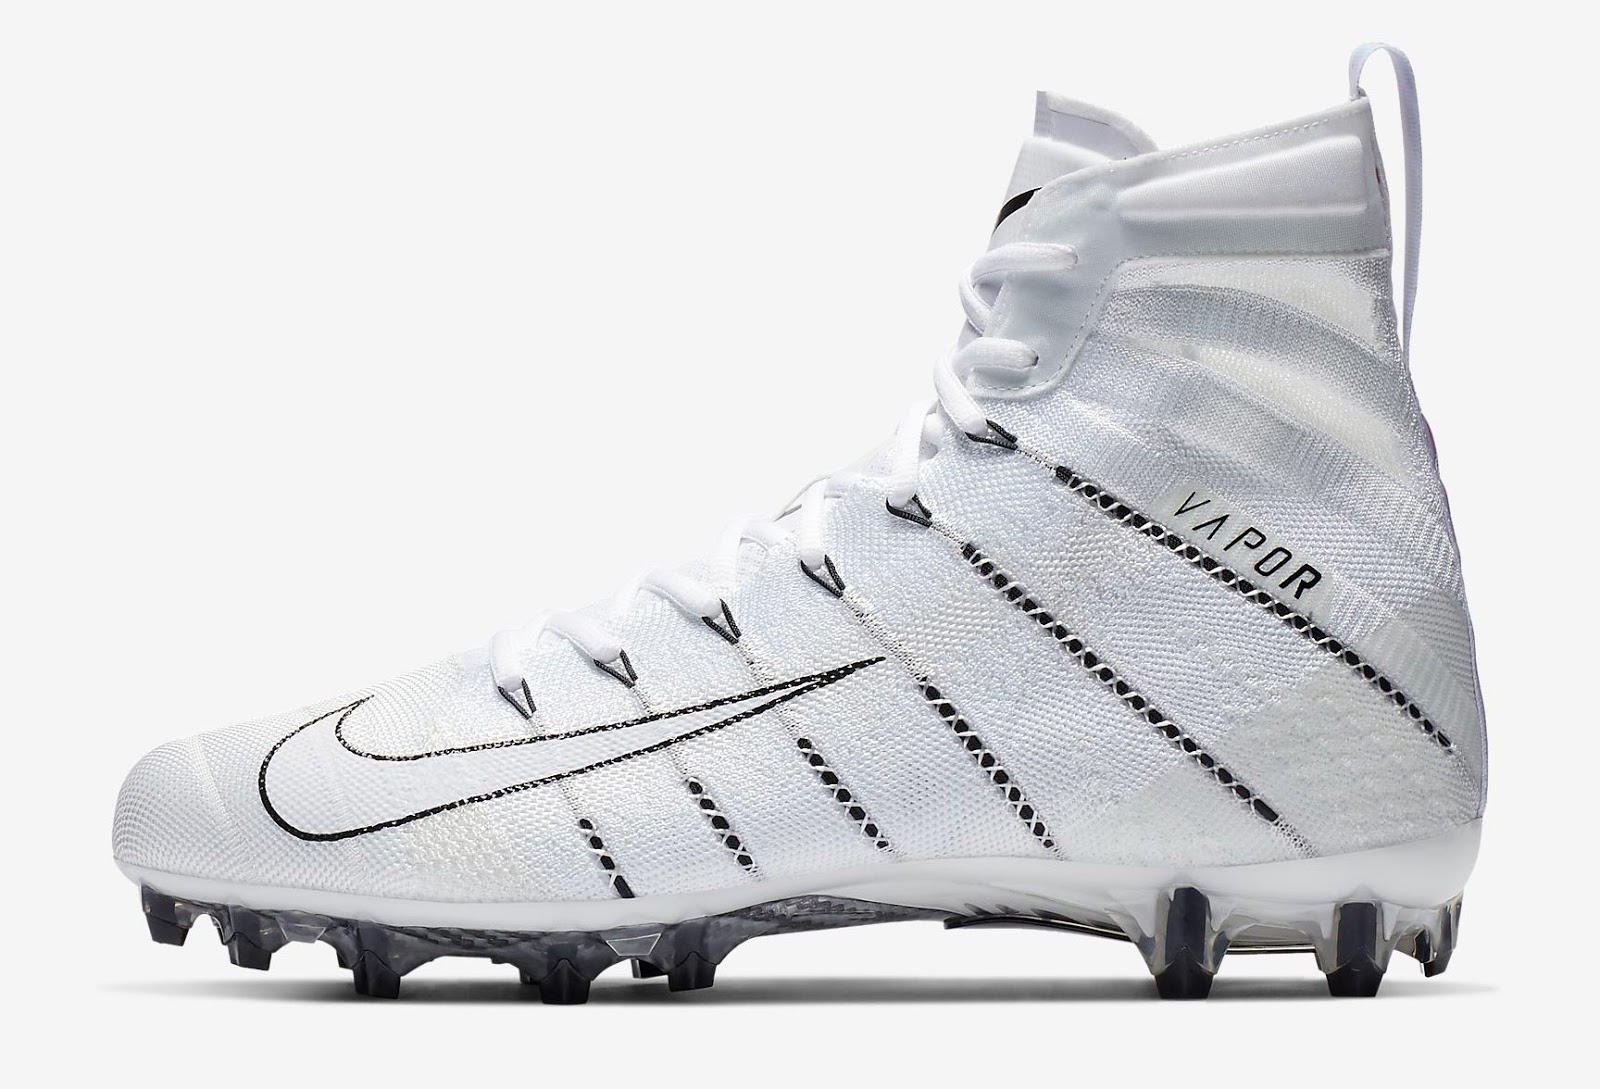 Nike Football Cleats 2019 High Top